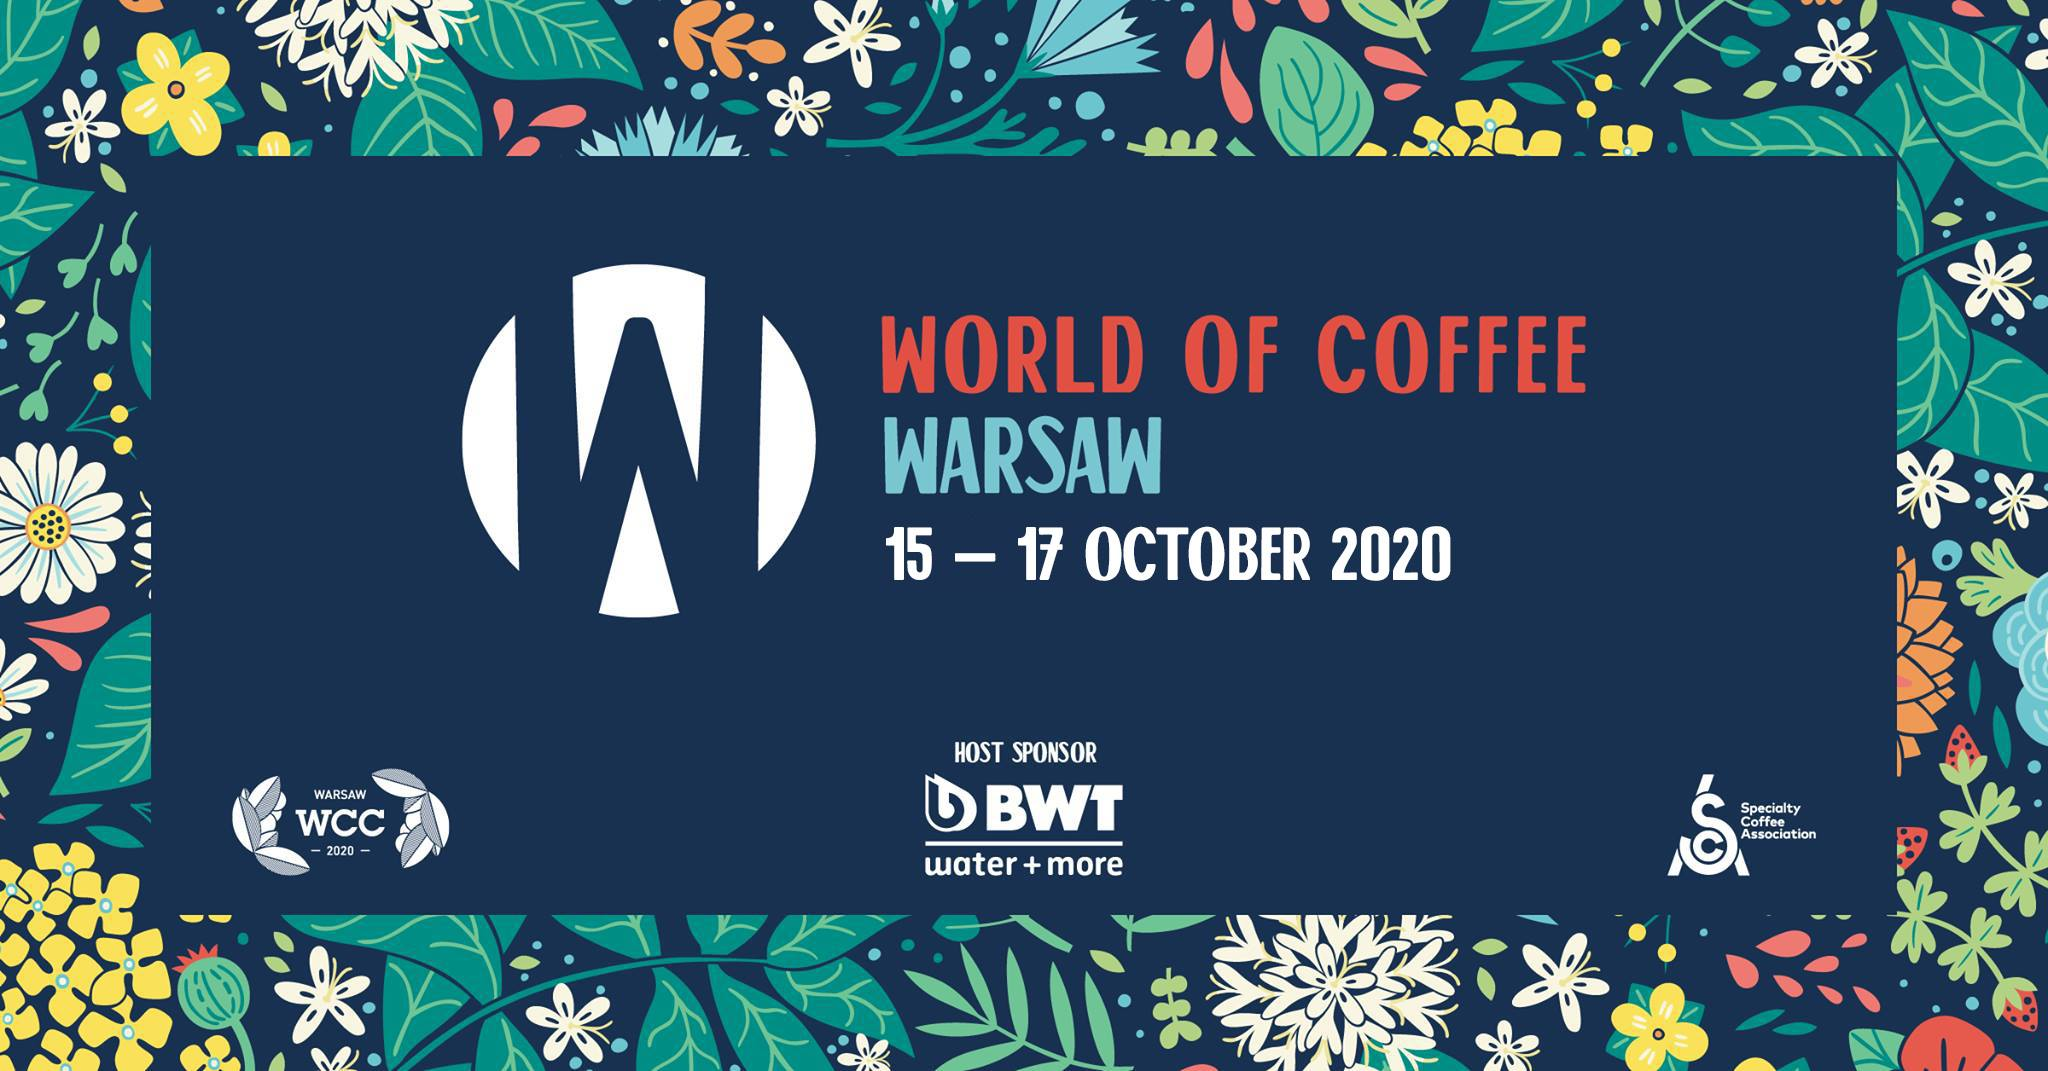 World of Coffee Warsaw 2020